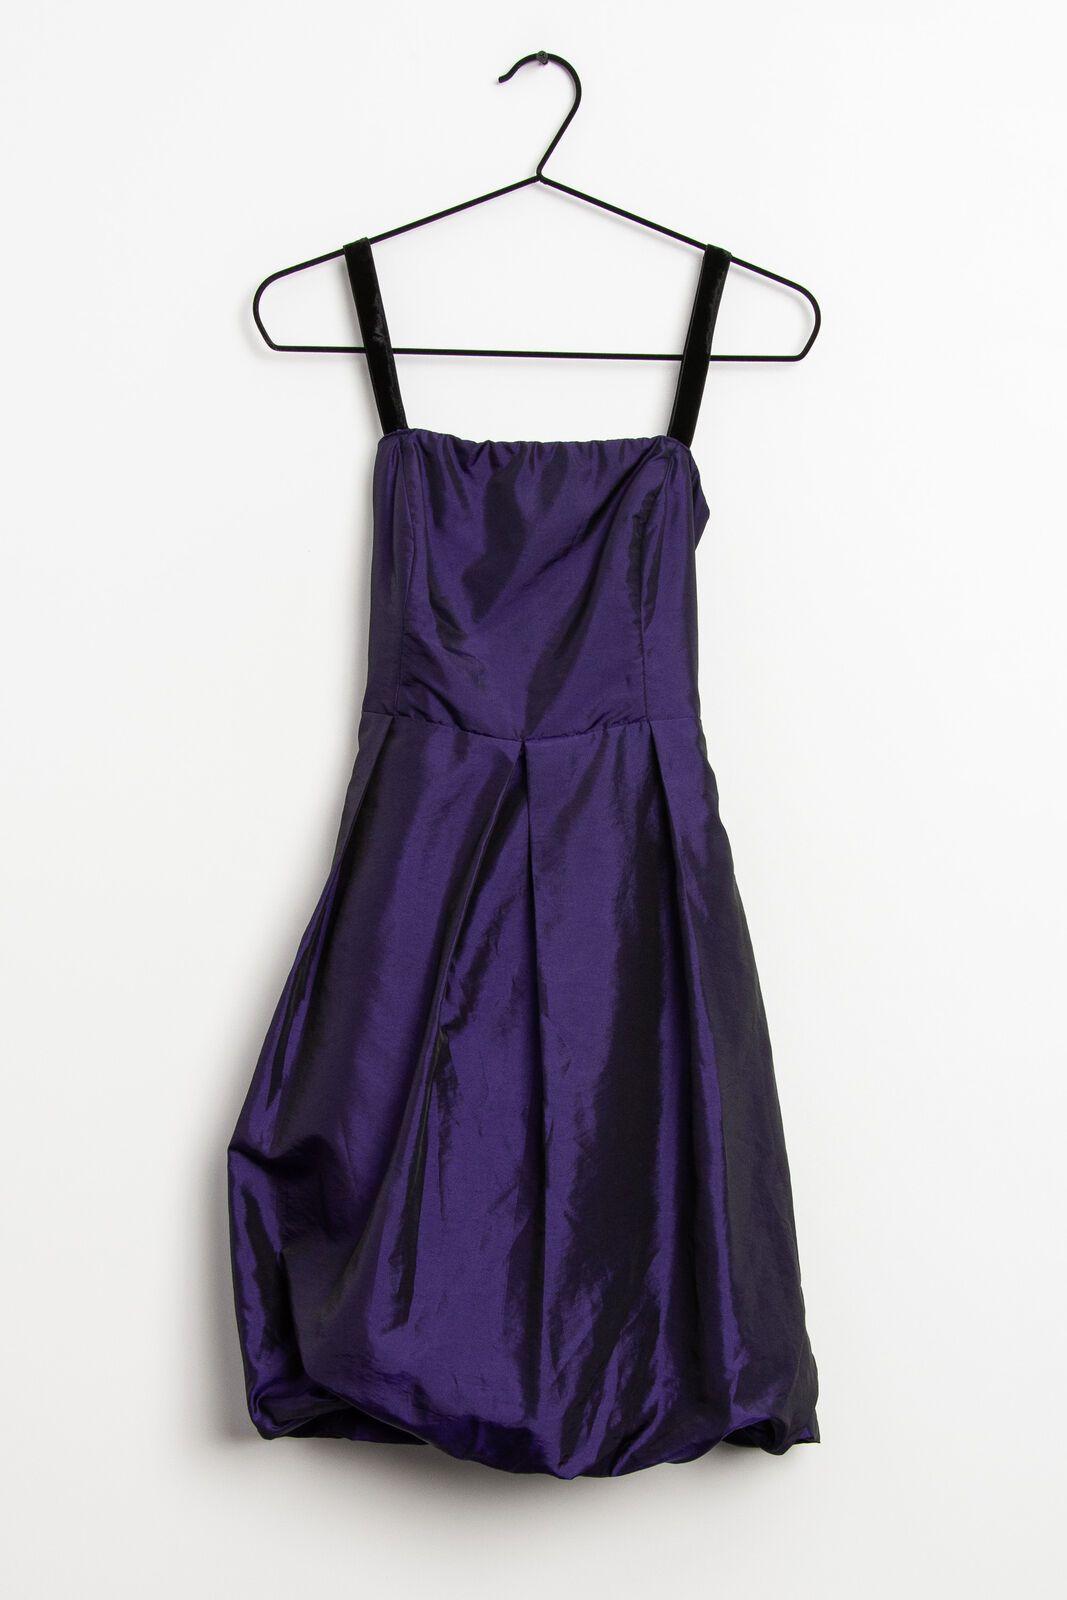 Bruno Banani Kleid Lila Gr.11 - Kleid Lila - Ideas of Kleid Lila